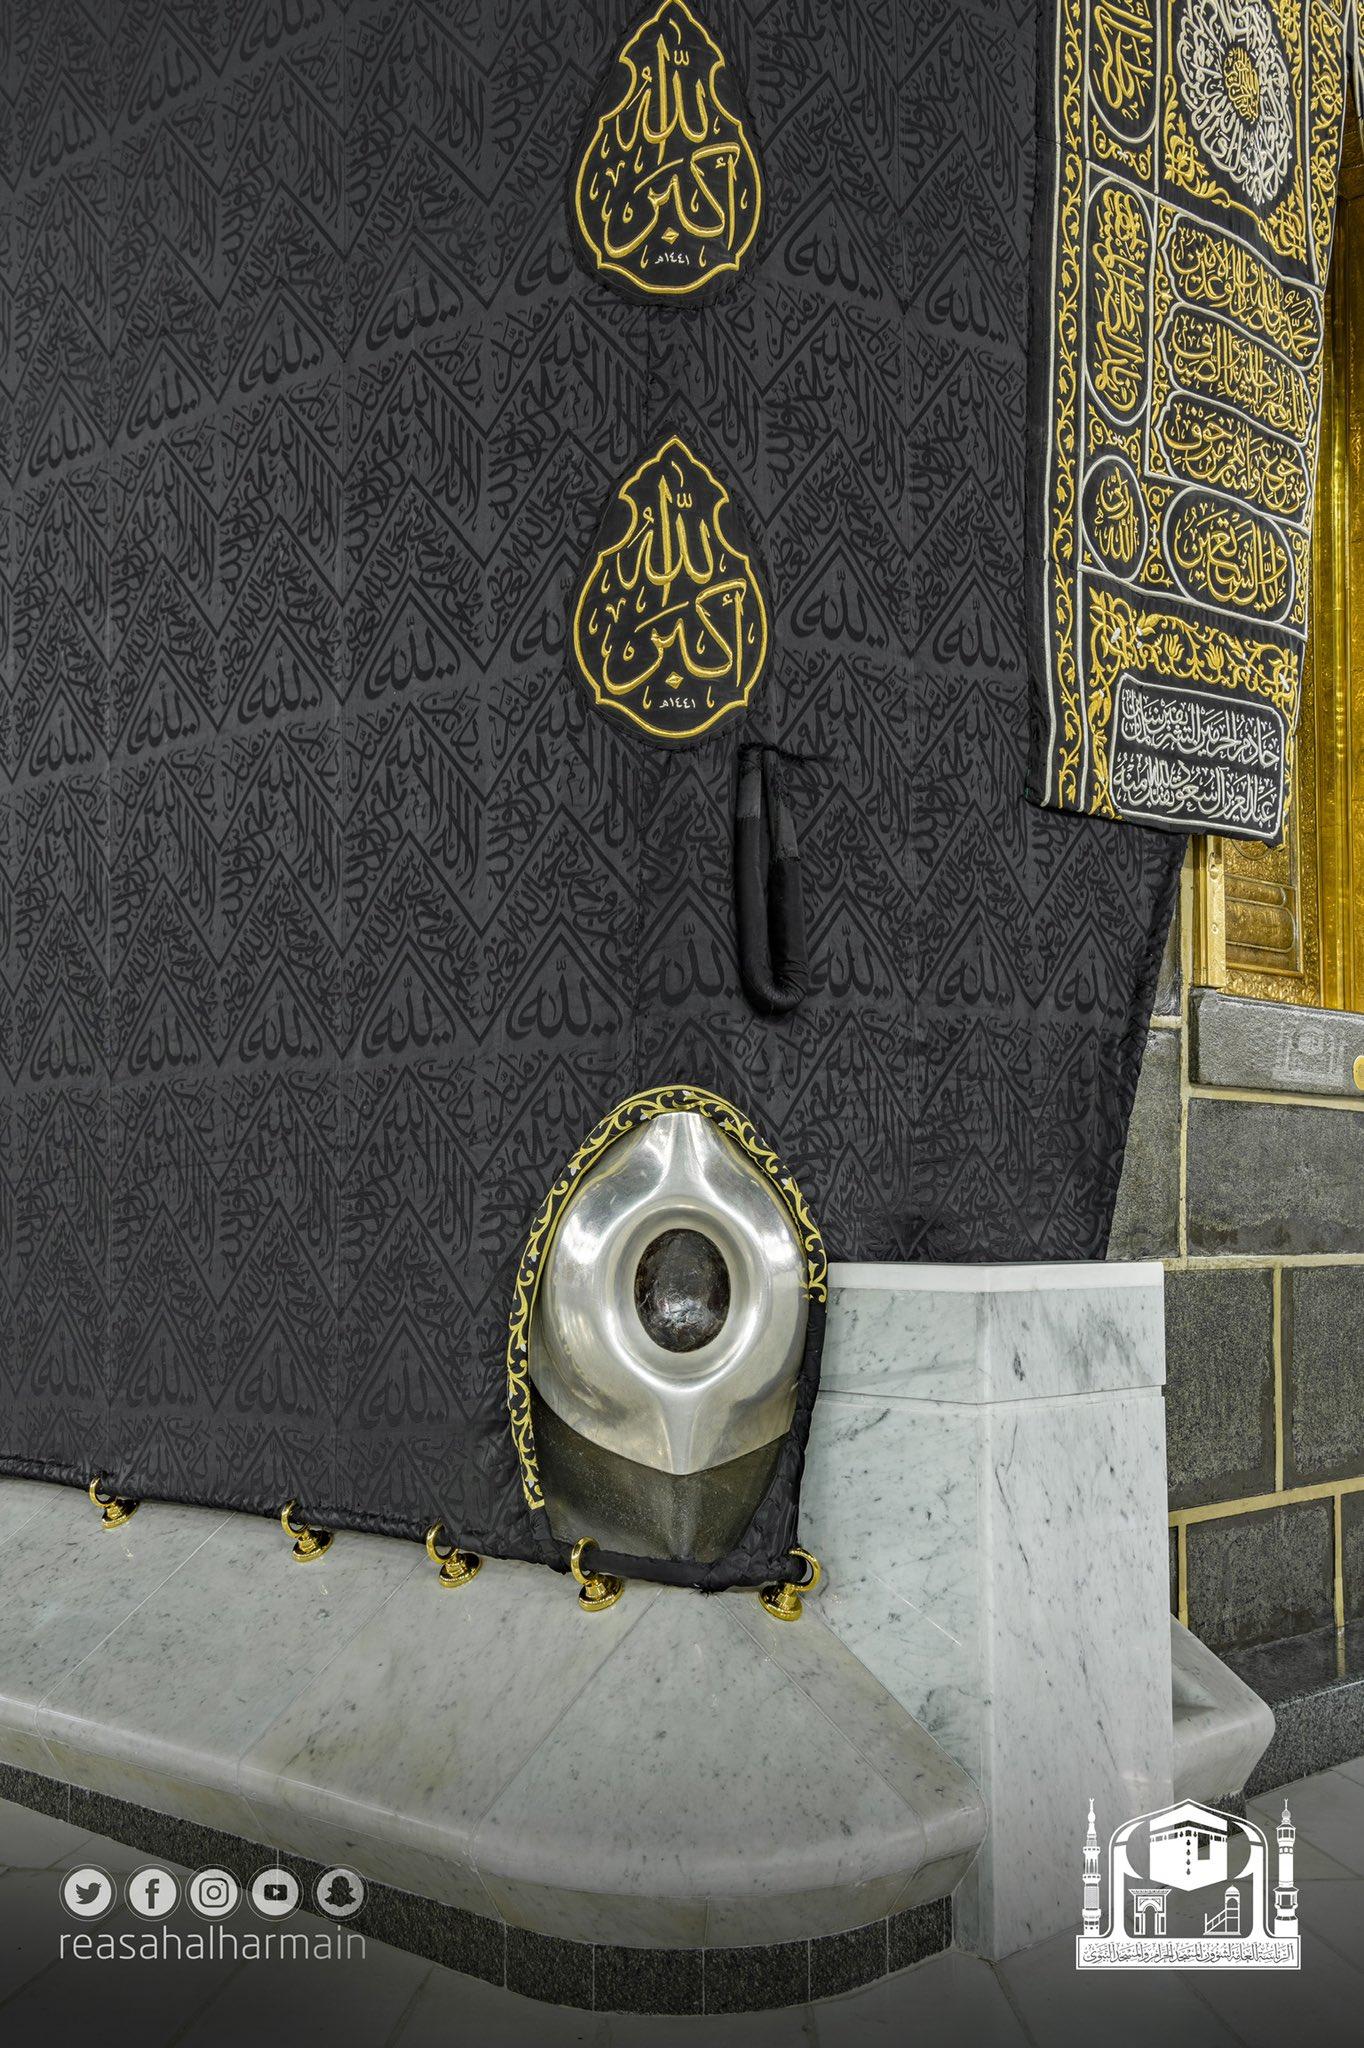 hajr-e-aswad-latest-images